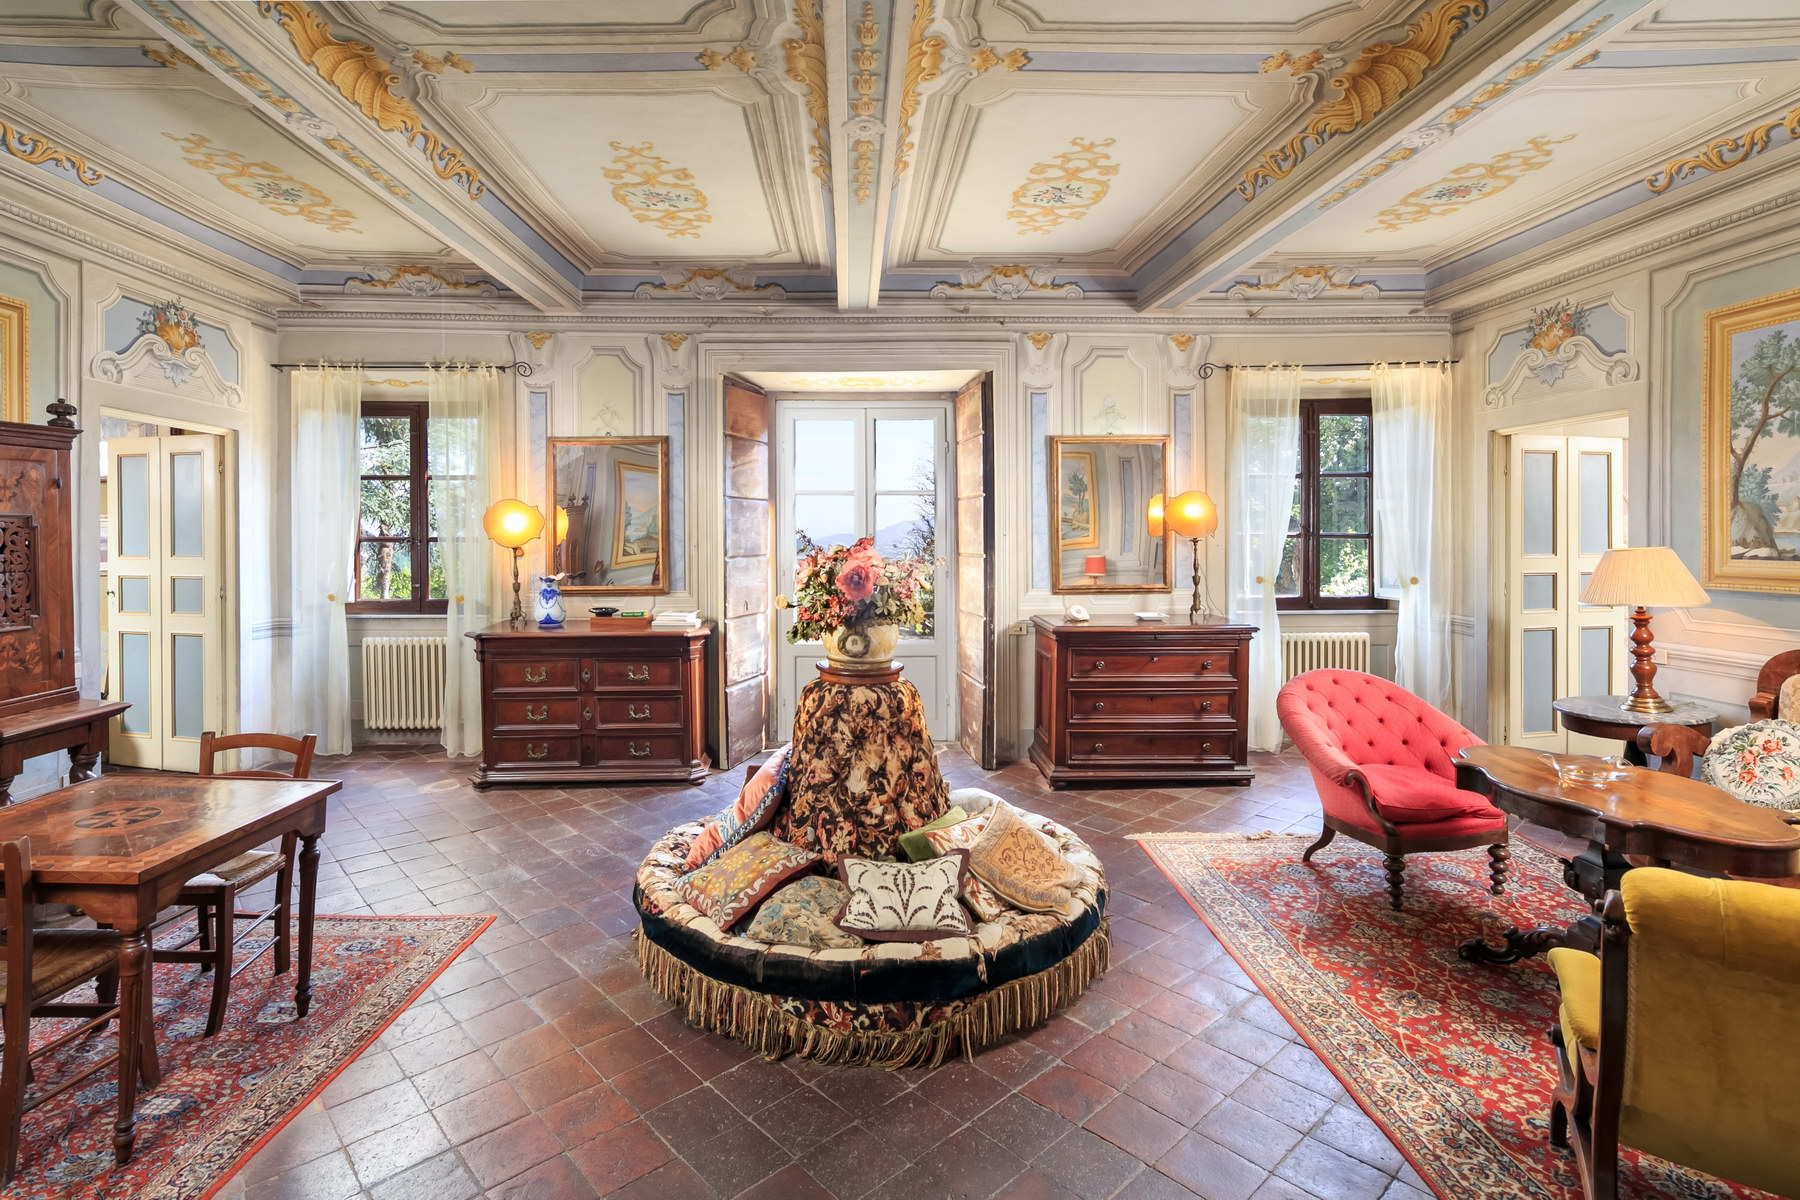 Villa in Vendita a Capannori: 5 locali, 570 mq - Foto 5